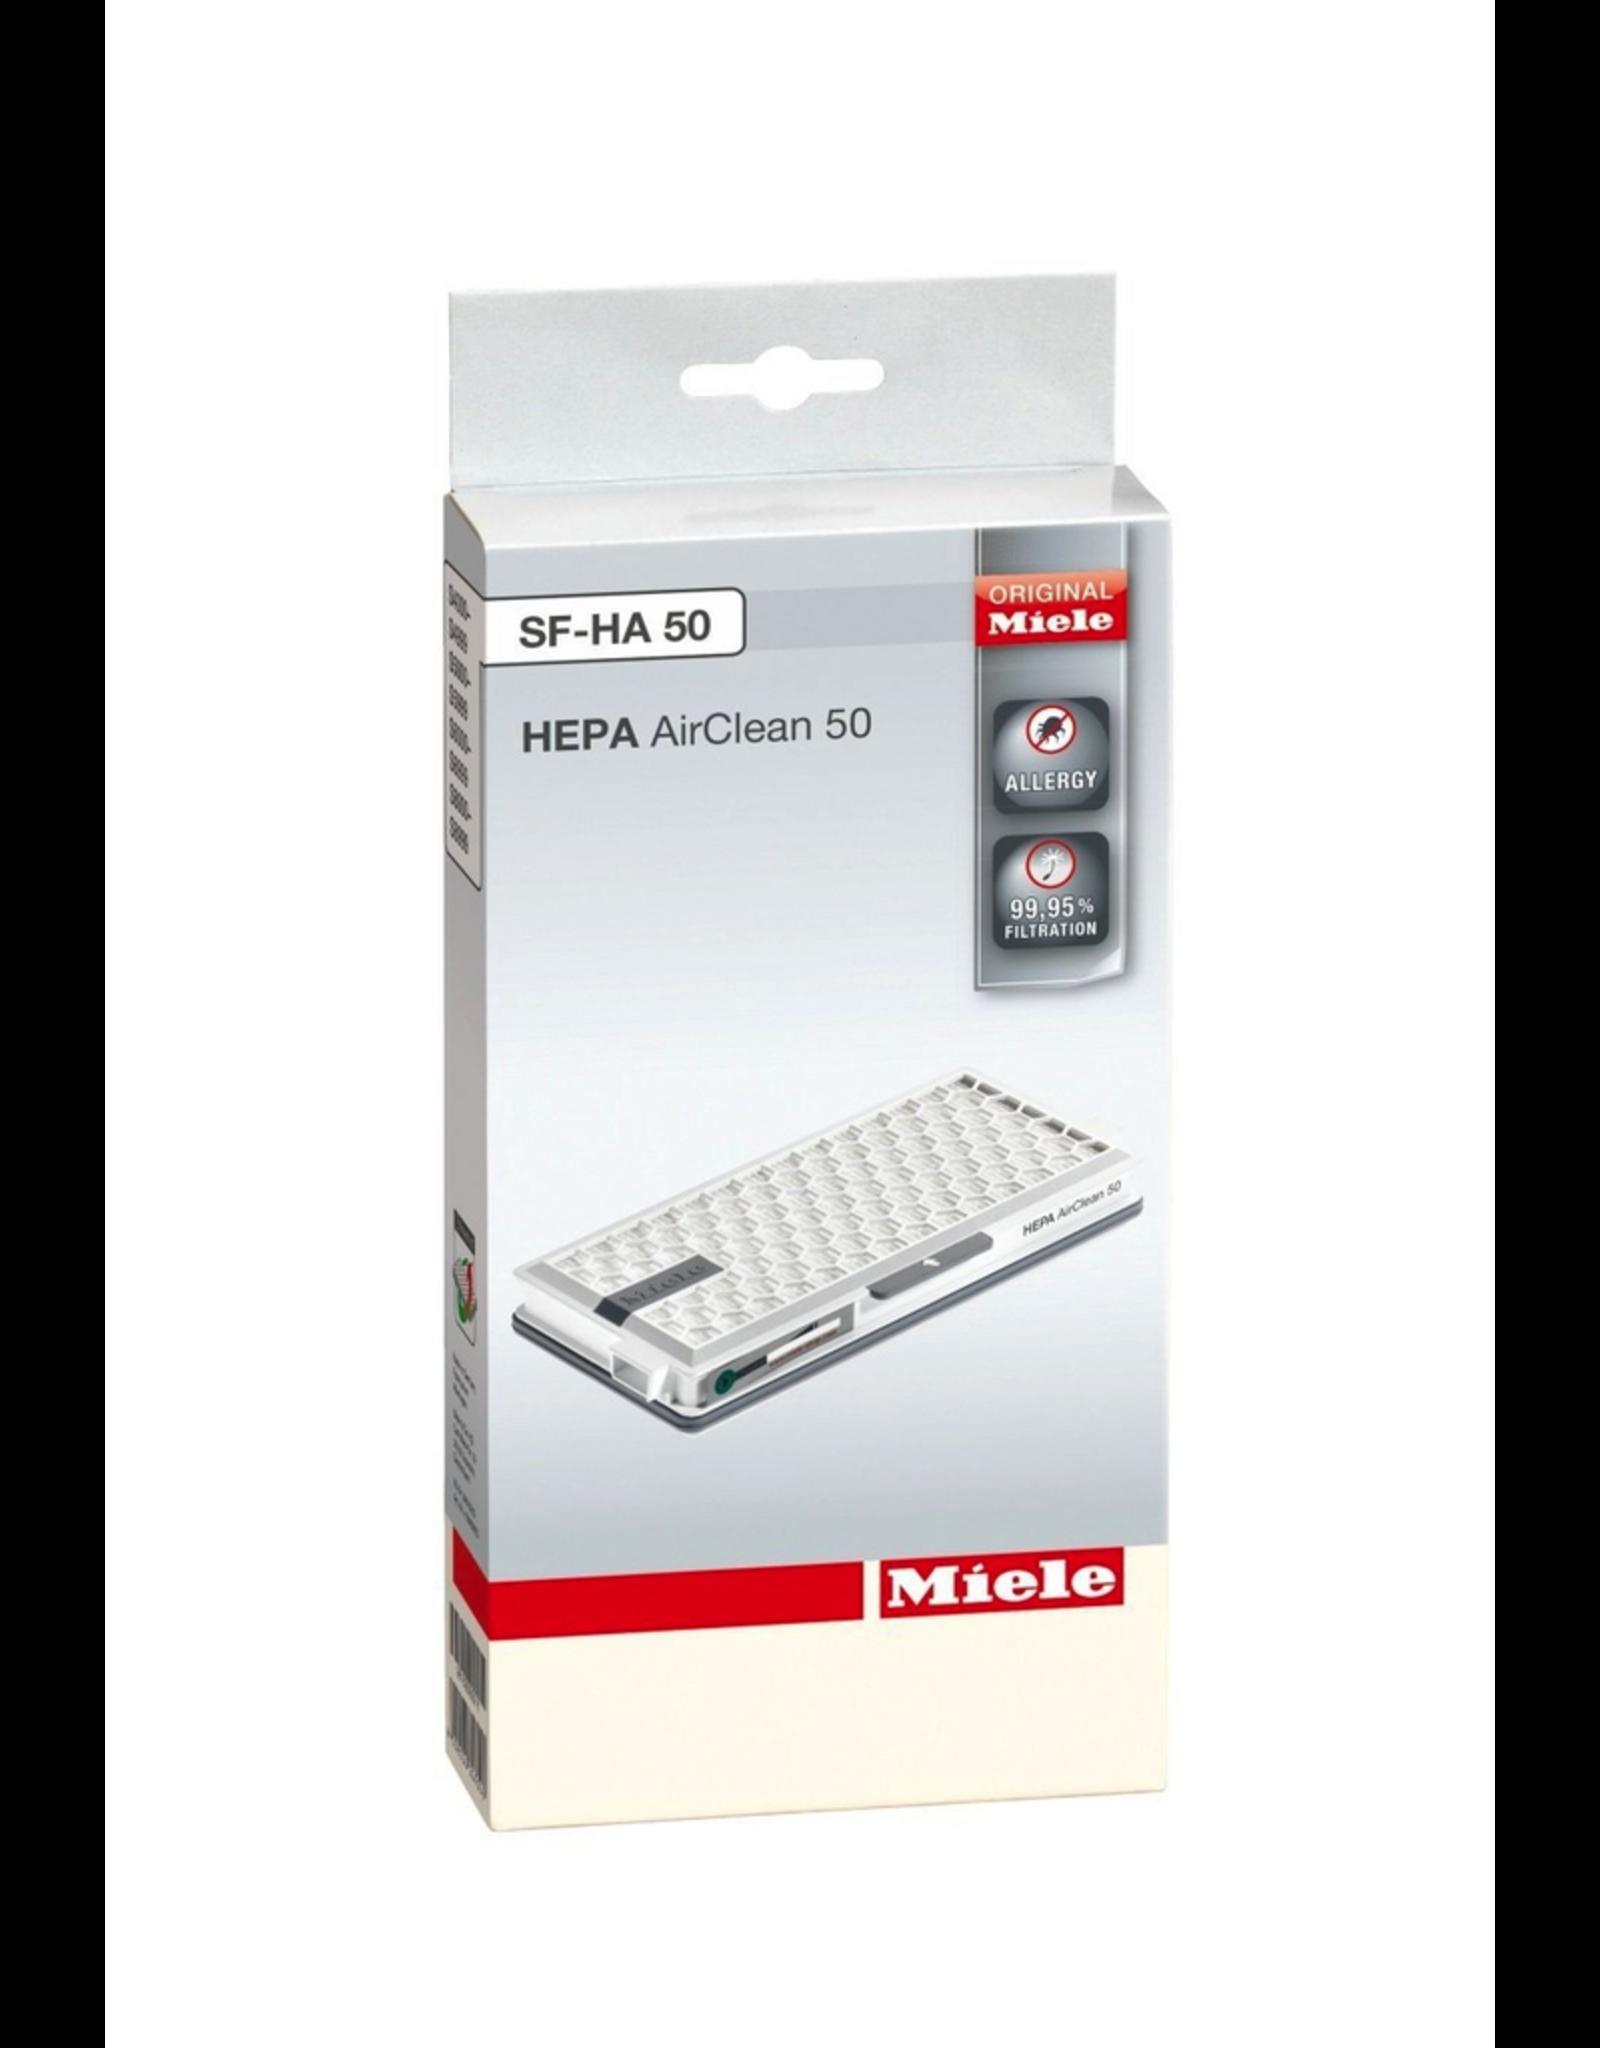 Miele Miele HA-50 HEPA Filter